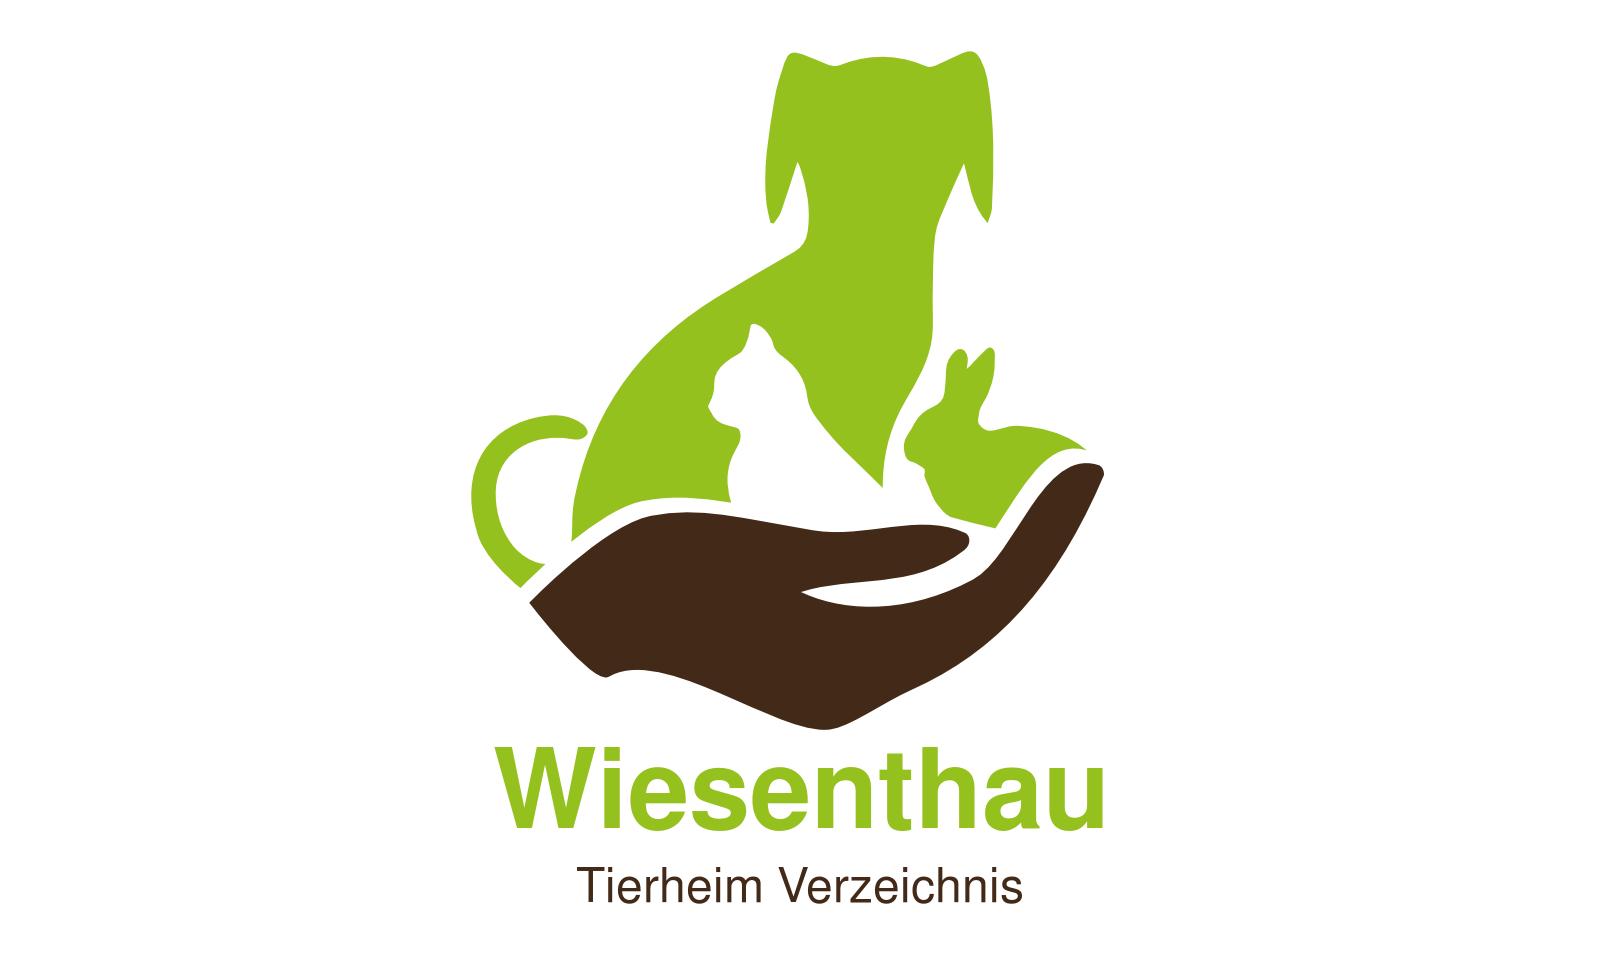 Tierheim Wiesenthau